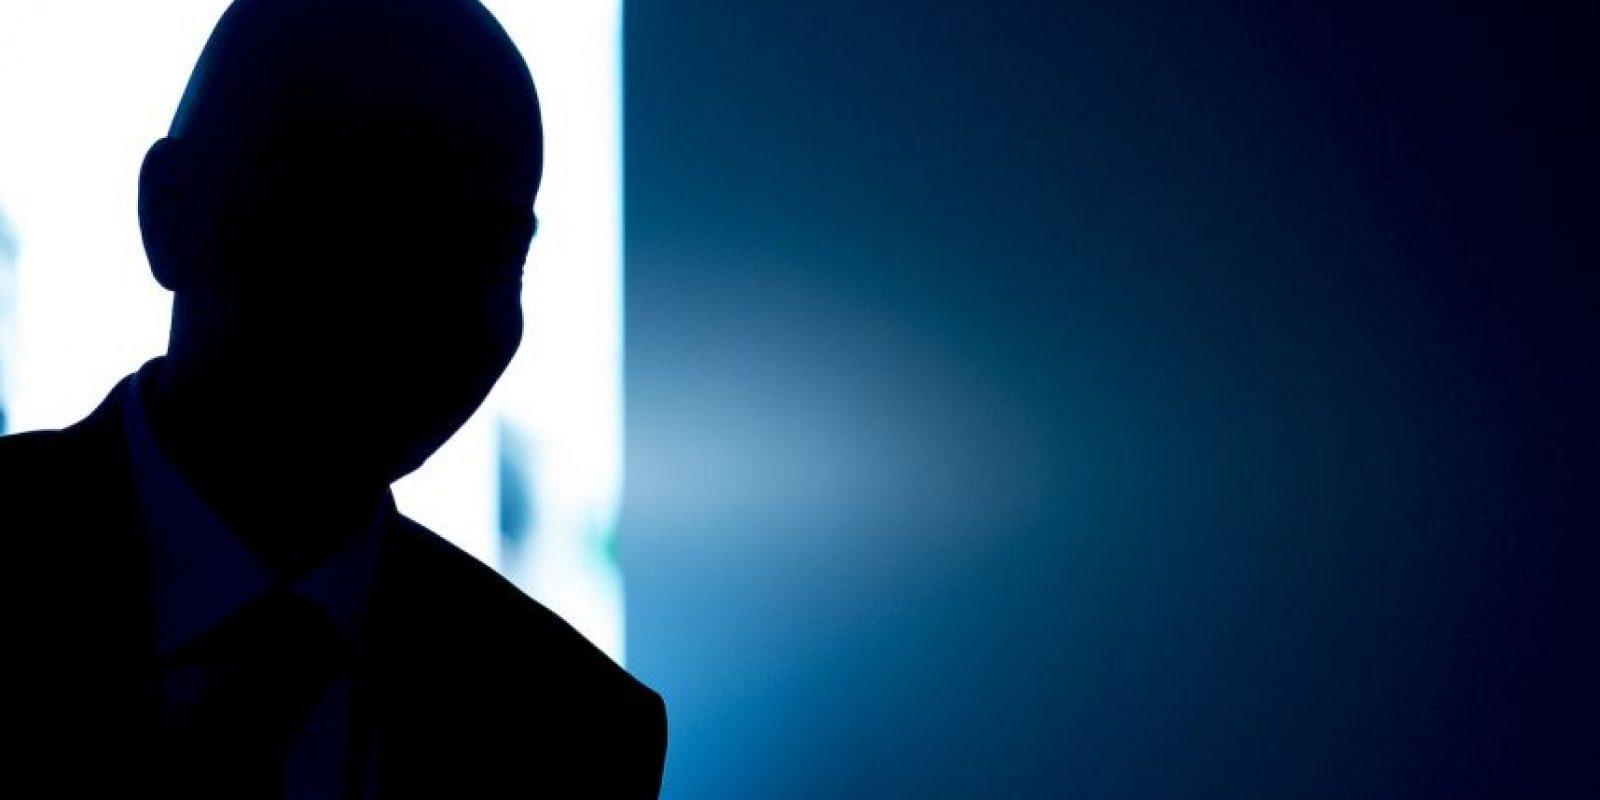 Gianni Infantino, el nuevo presidente de la FIFA Foto:Getty Images